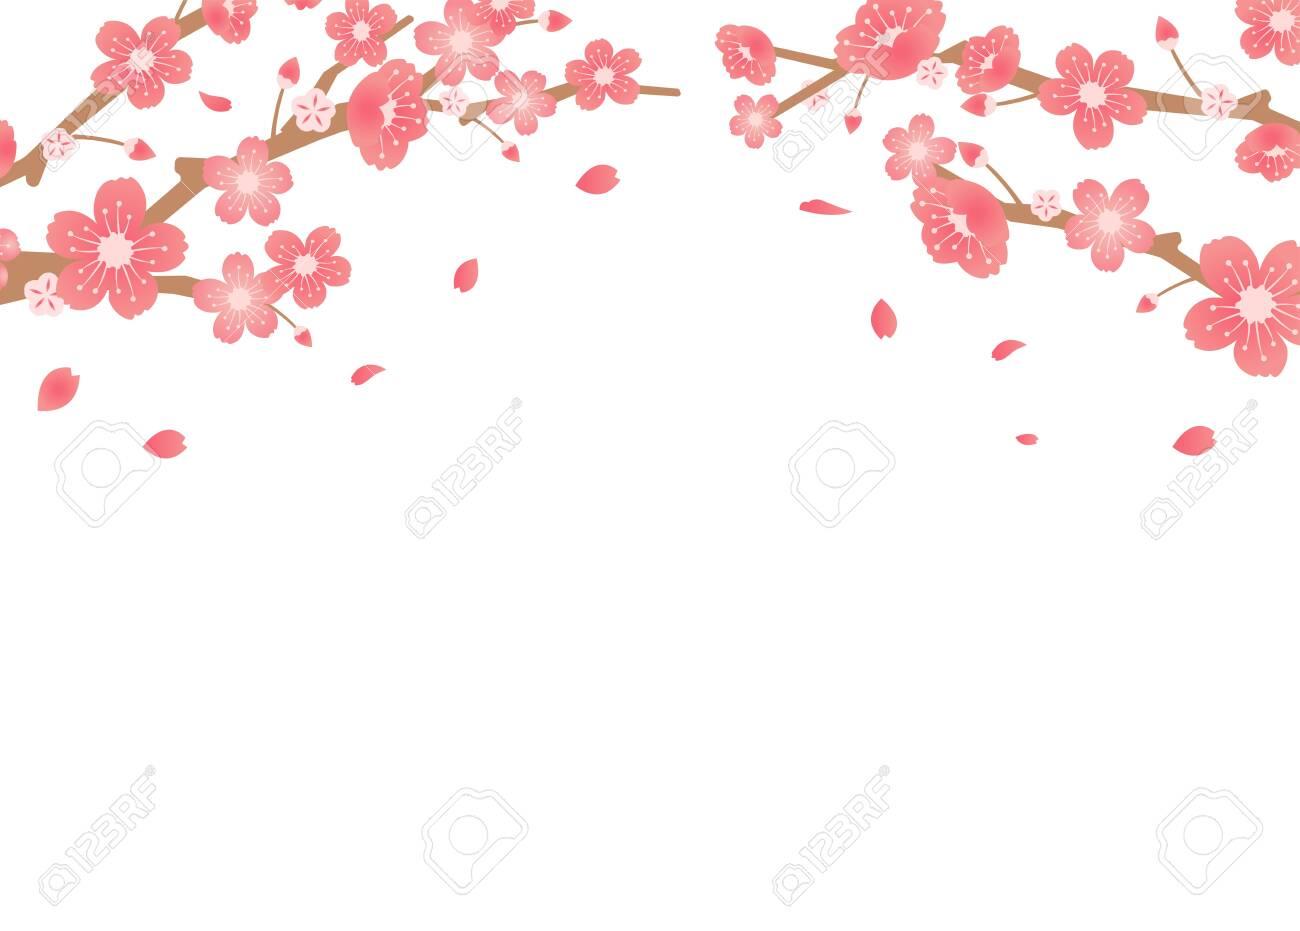 Cherry blossoms background illustration ( spring season theme ) - 141548726